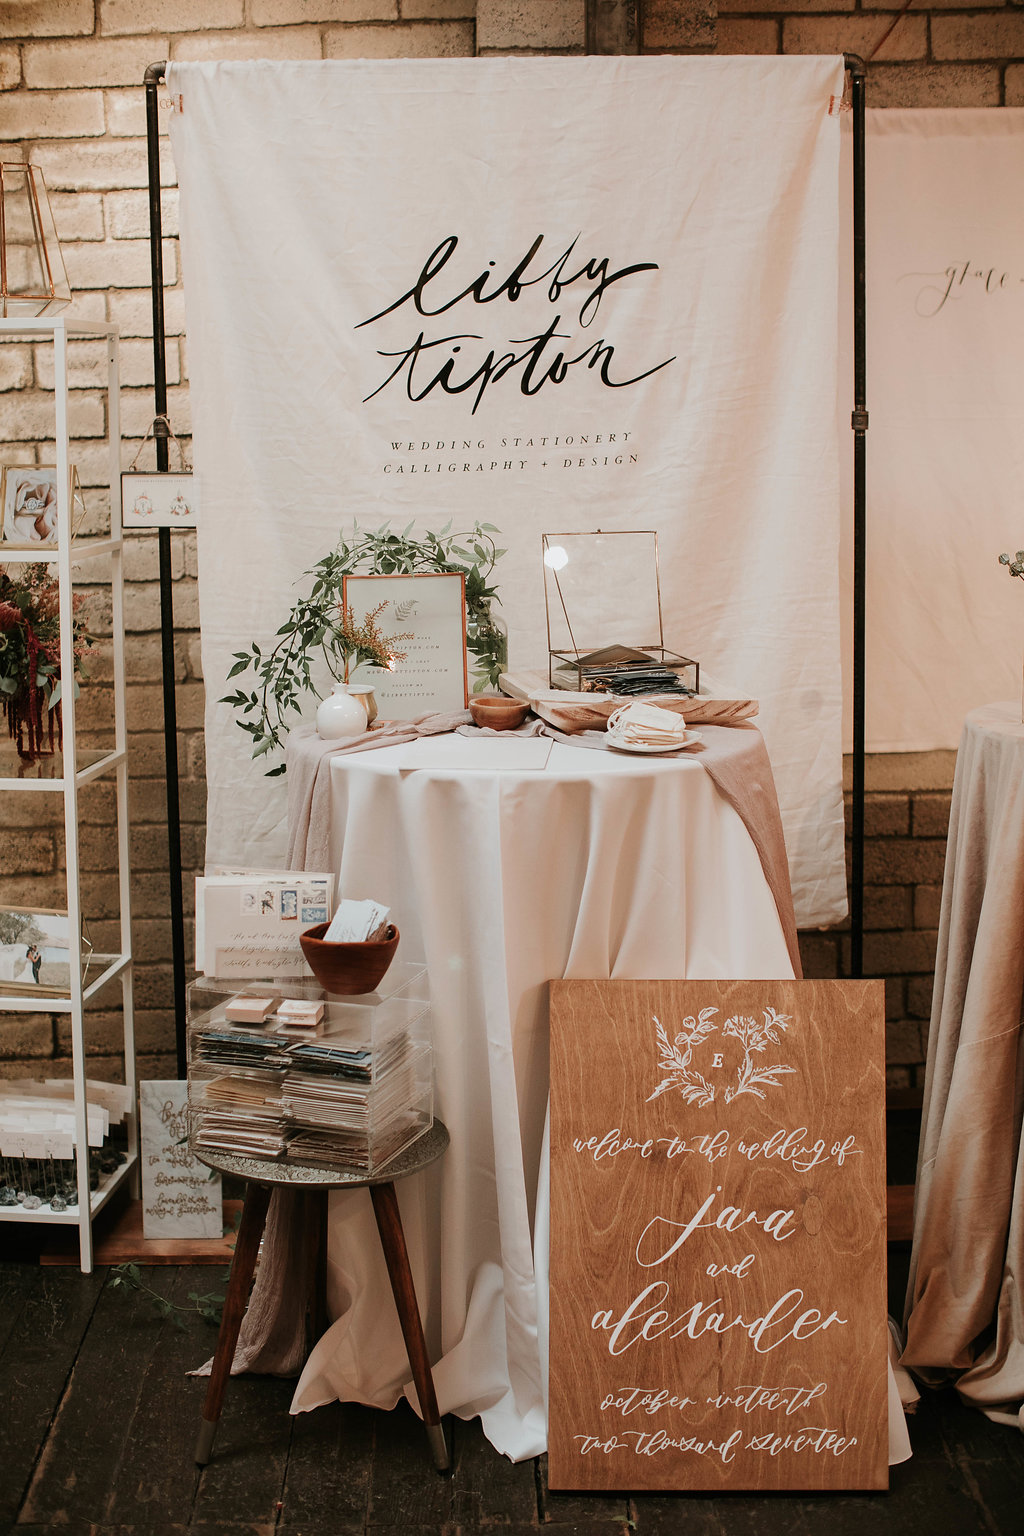 The_Big_Fake_wedding_Seattle_Within_sodo_wedding_by_Adina_Preston_Weddings_173.JPG